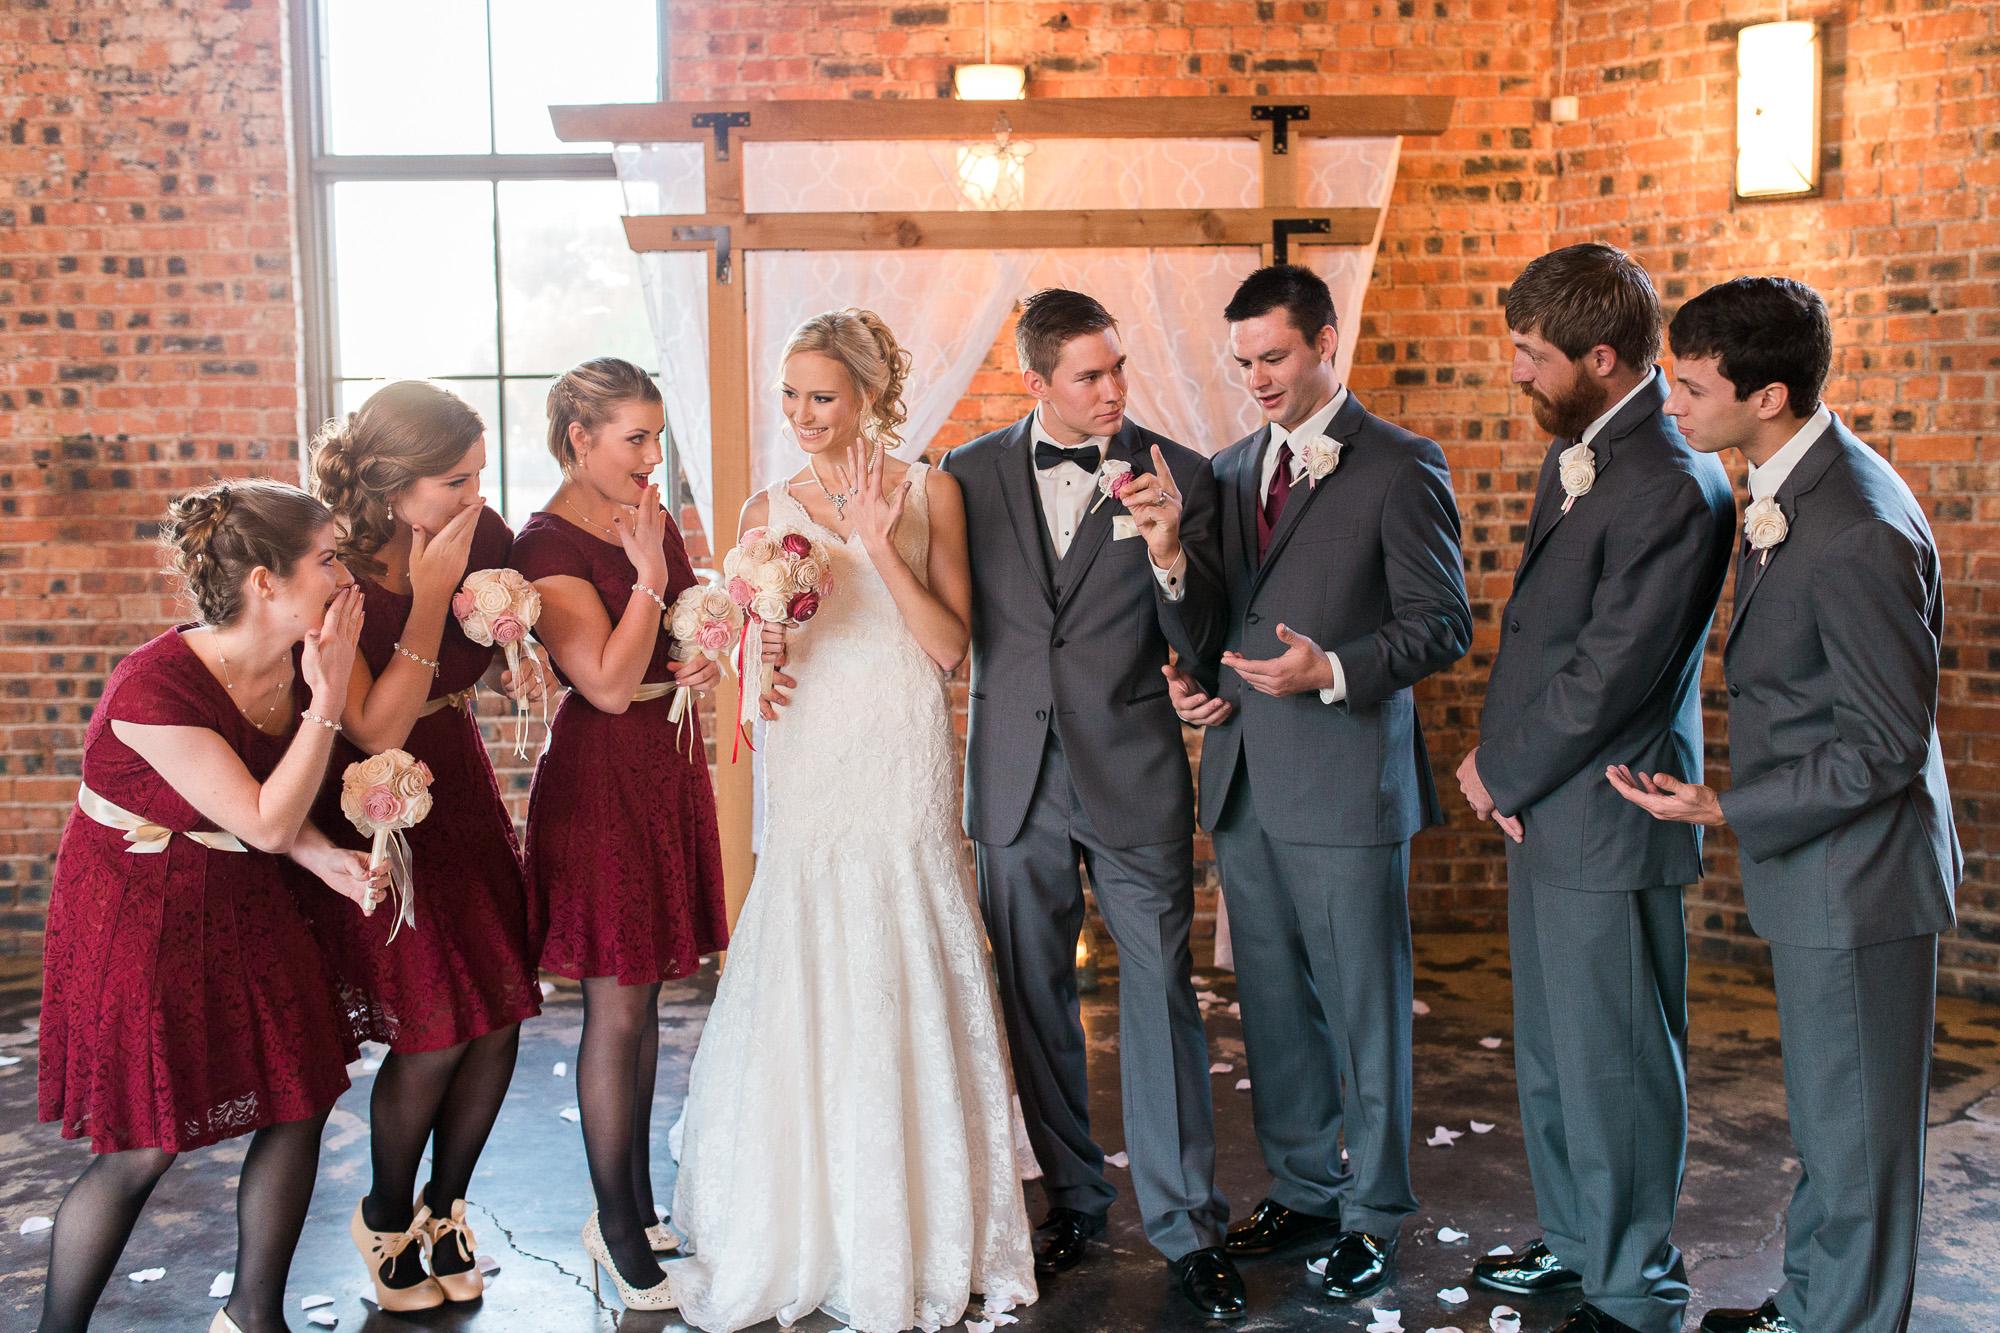 2f552-downtown-bryan-weddingdowntown-bryan-wedding.jpg